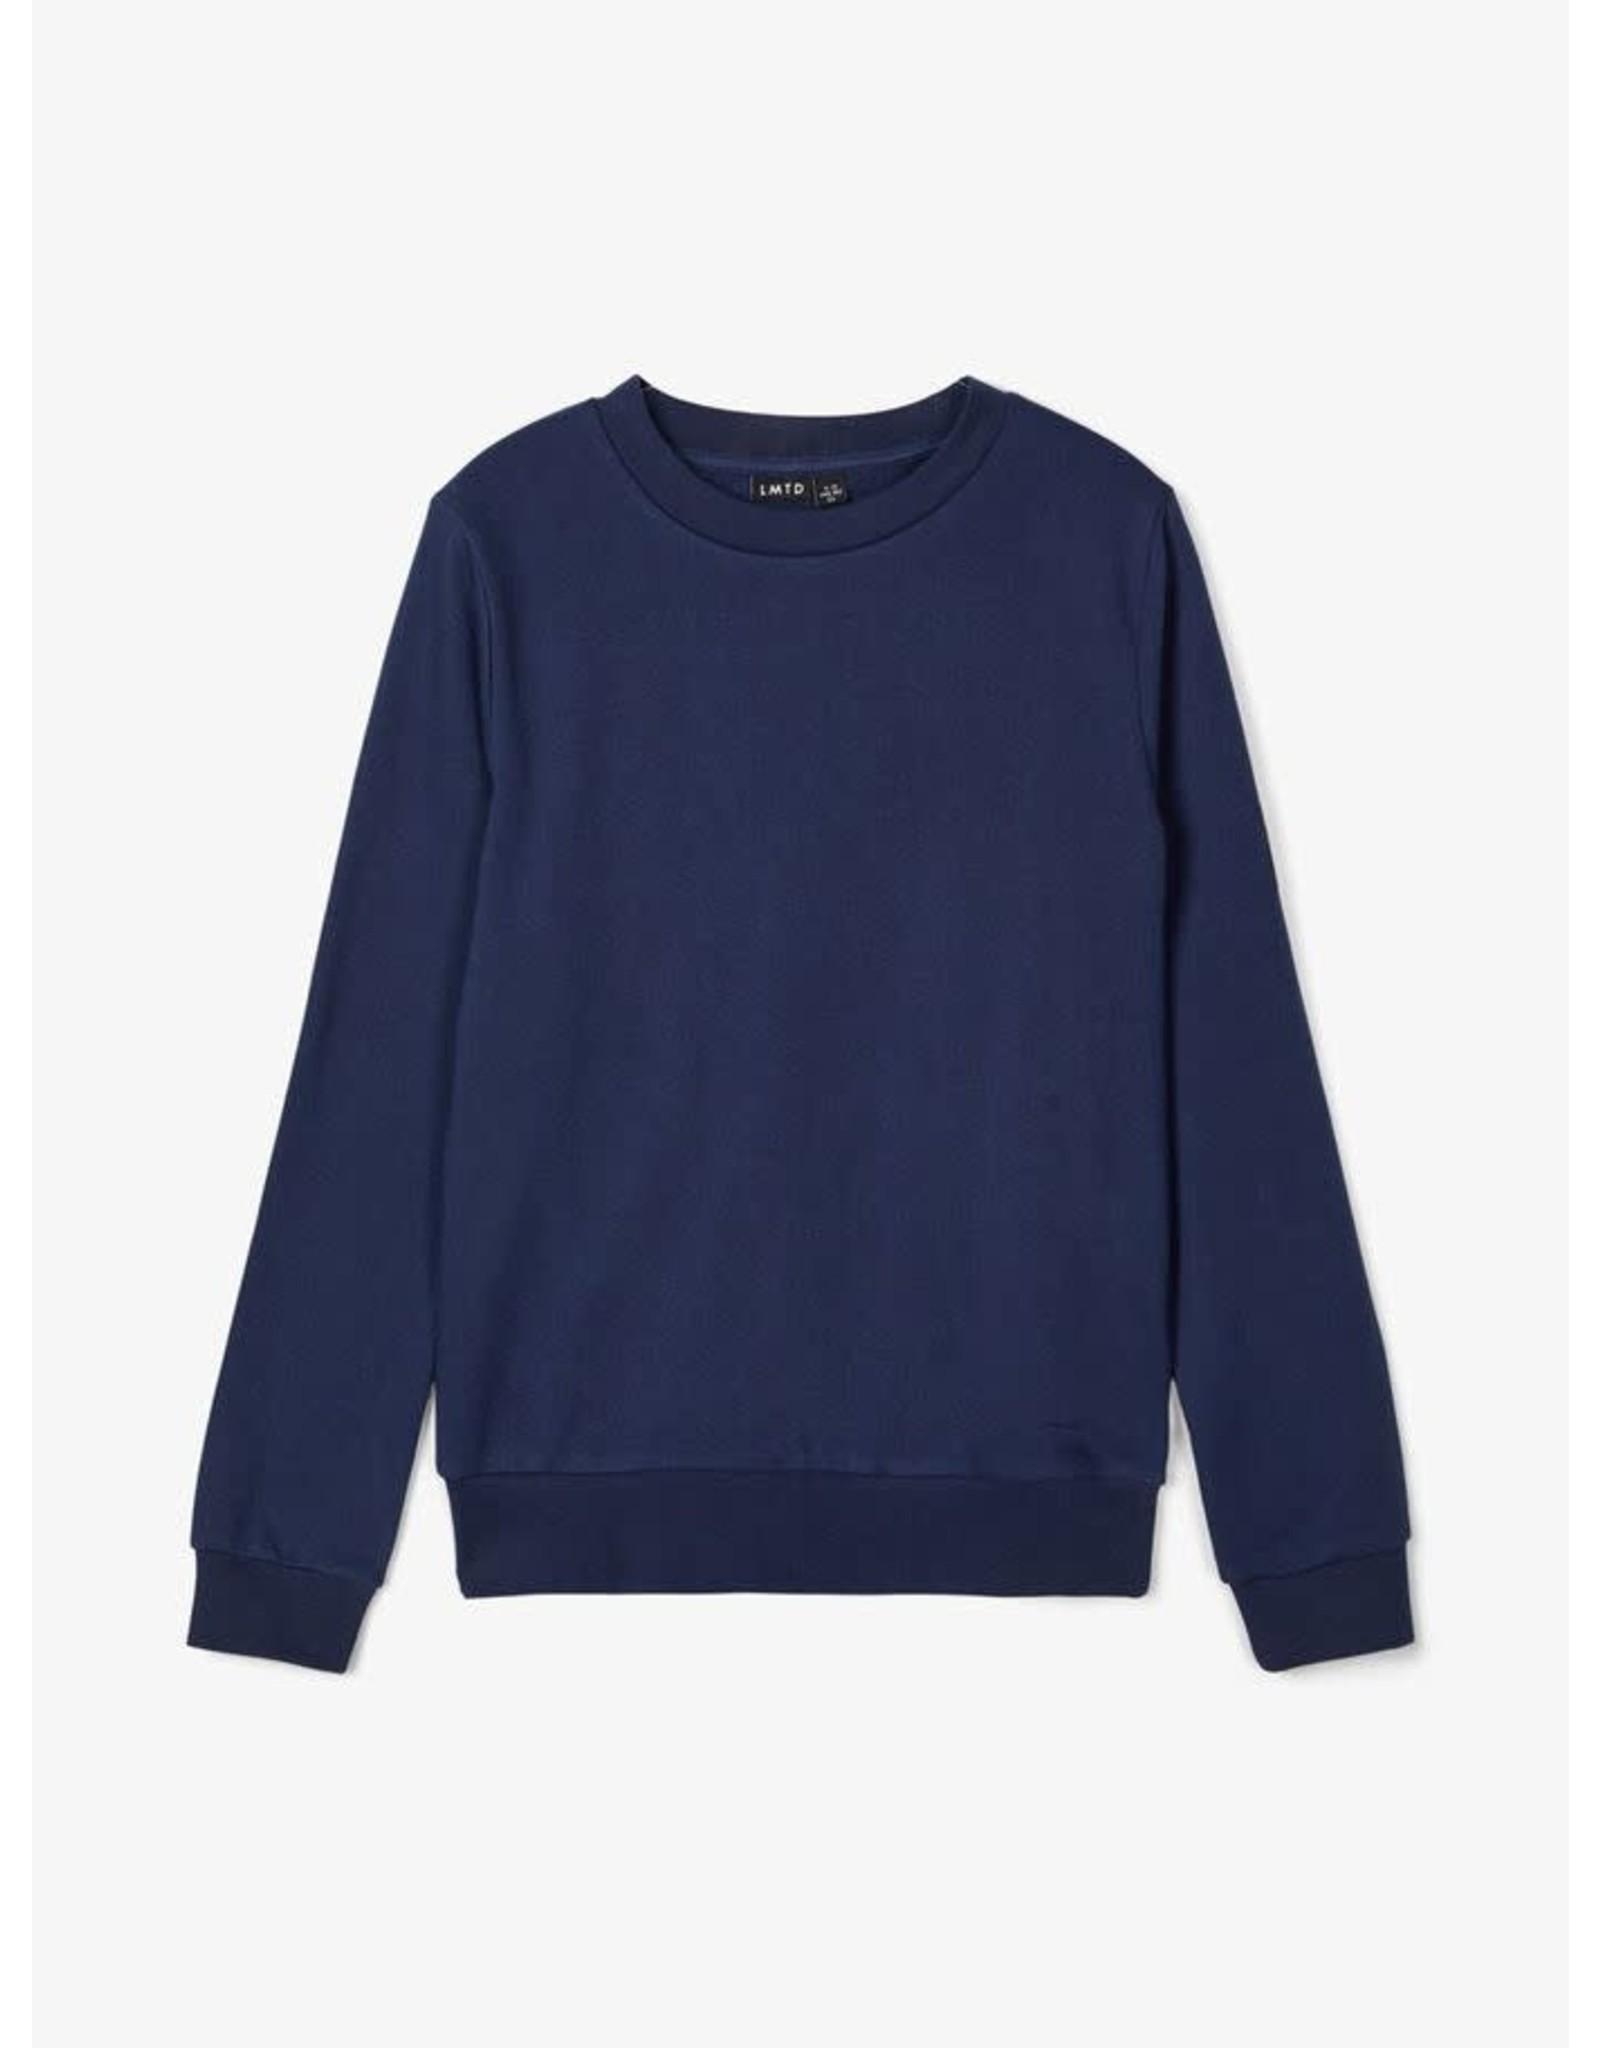 Name It Donkerblauwe sweater trui